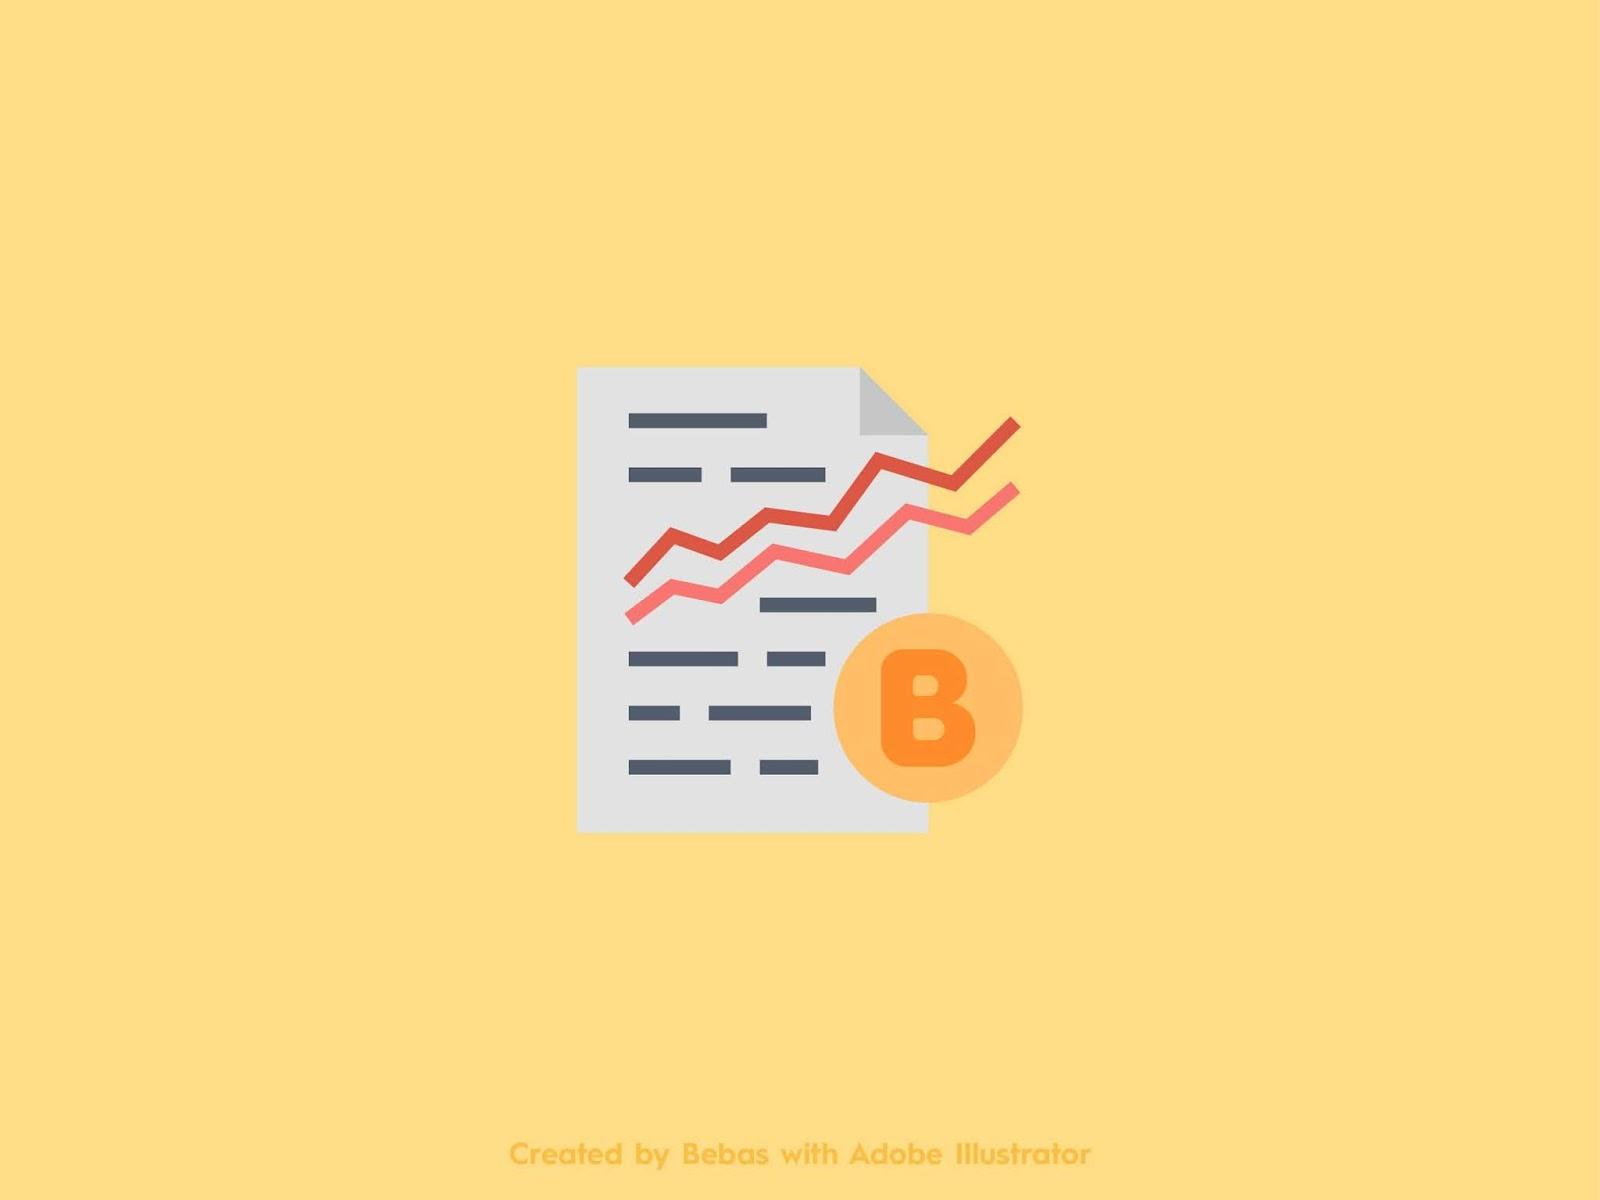 Cara Mengukur nilai SEO Dengan Melacak Keyword Ranking